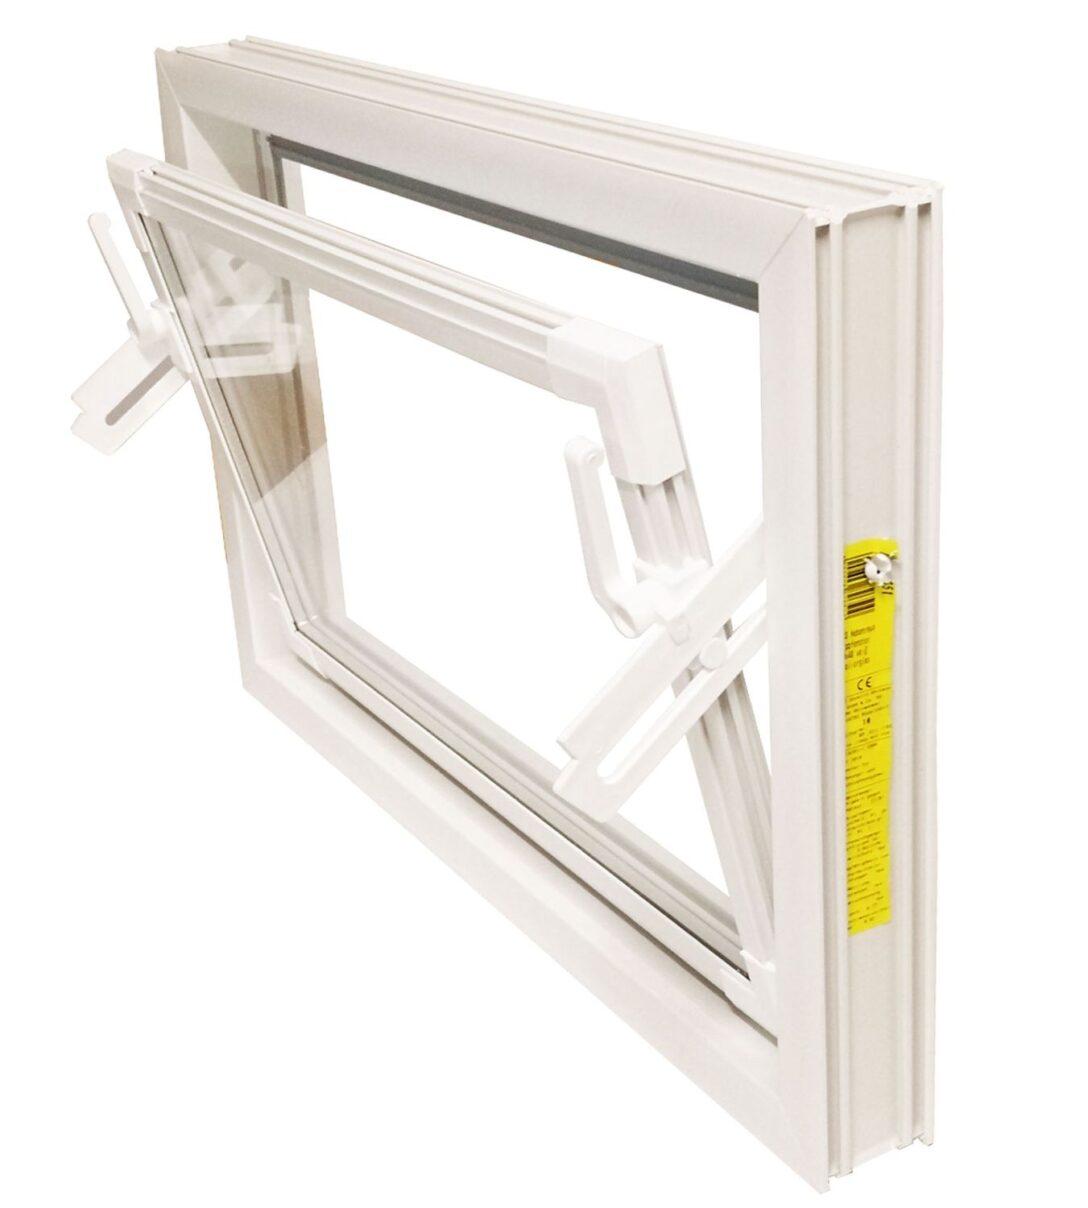 Large Size of Aco Kellerfenster Ersatzteile Therm Fenster Velux Wohnzimmer Aco Kellerfenster Ersatzteile